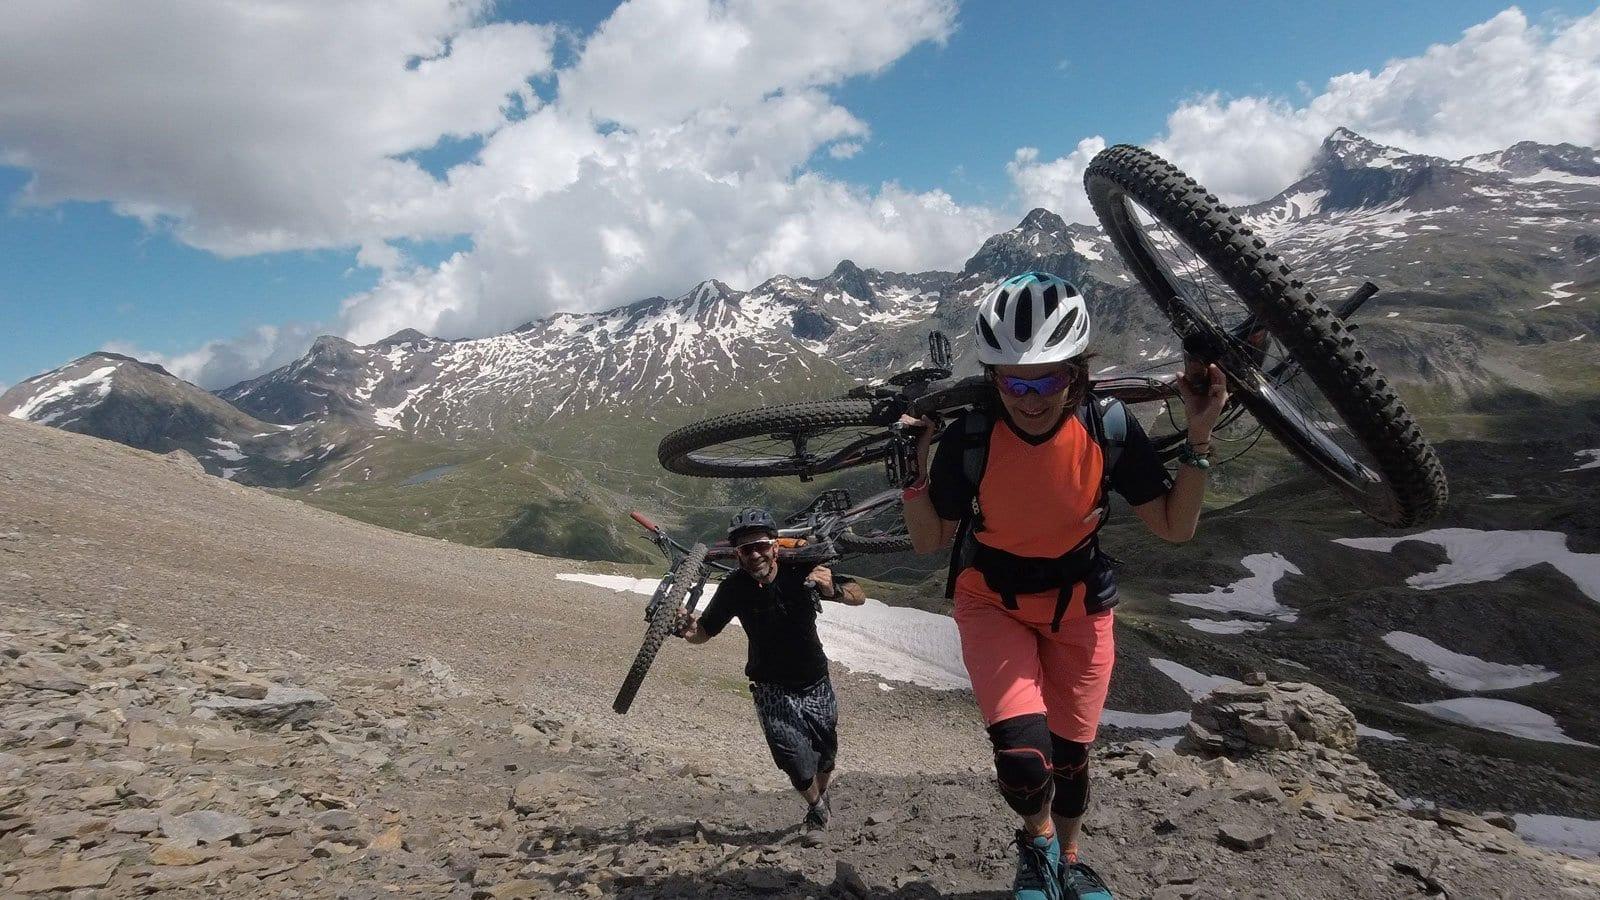 cogne mountain biking